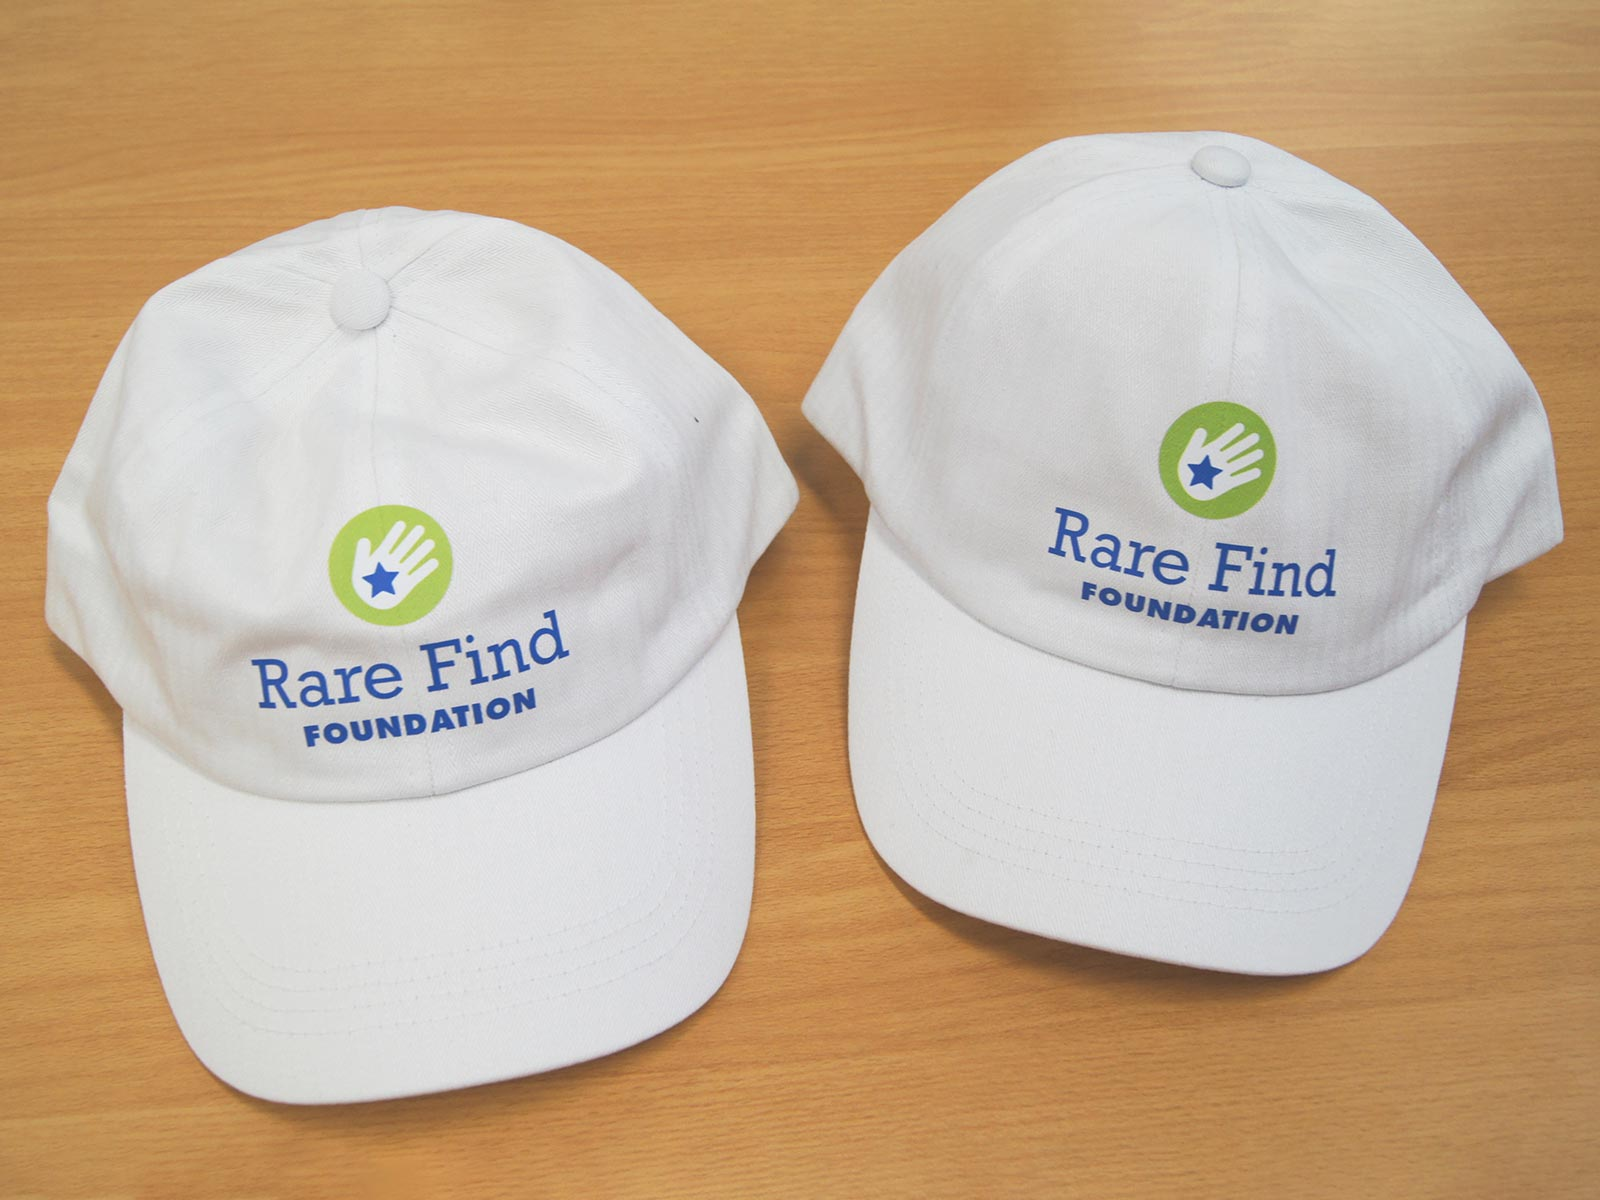 Rare Find Foundation white baseball caps